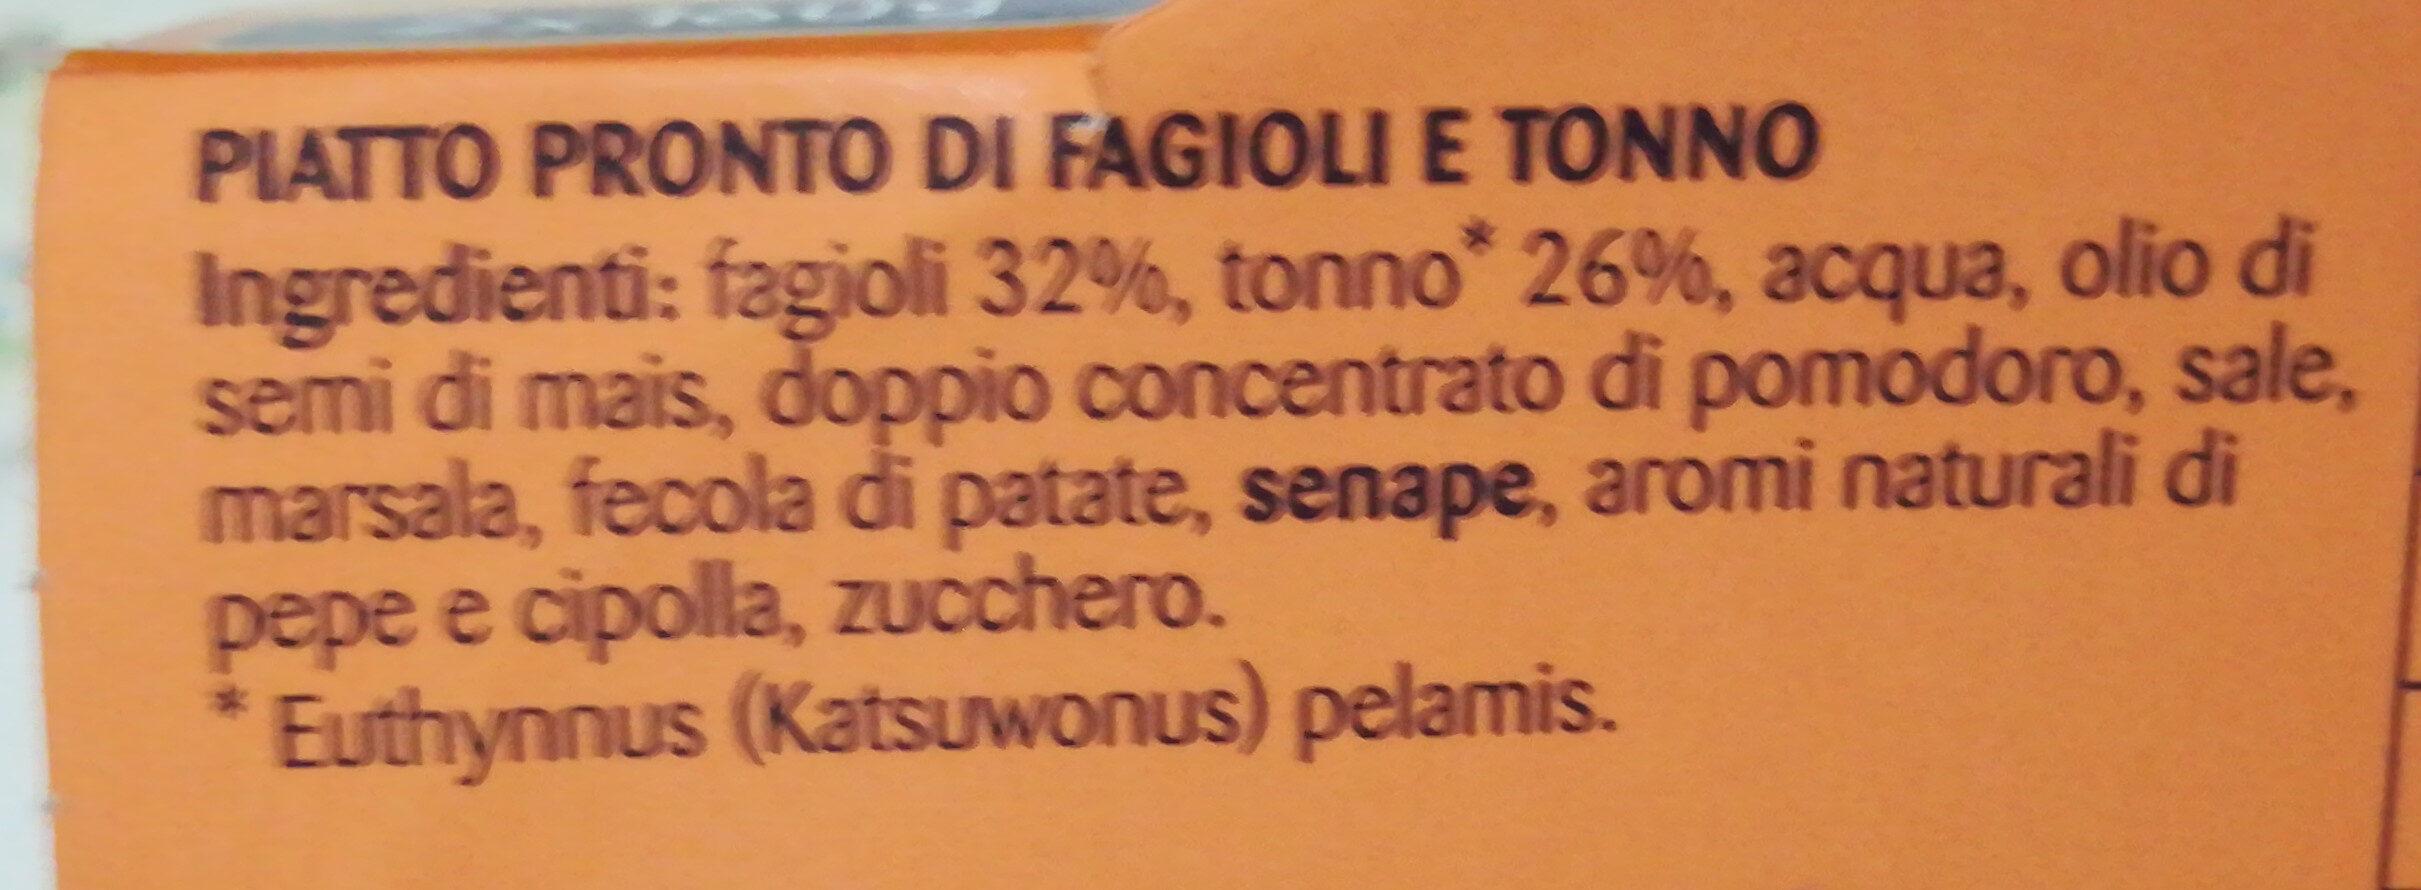 Riomare Congusto Fagioli Tonno GR. 160X2 - Ingredients - it